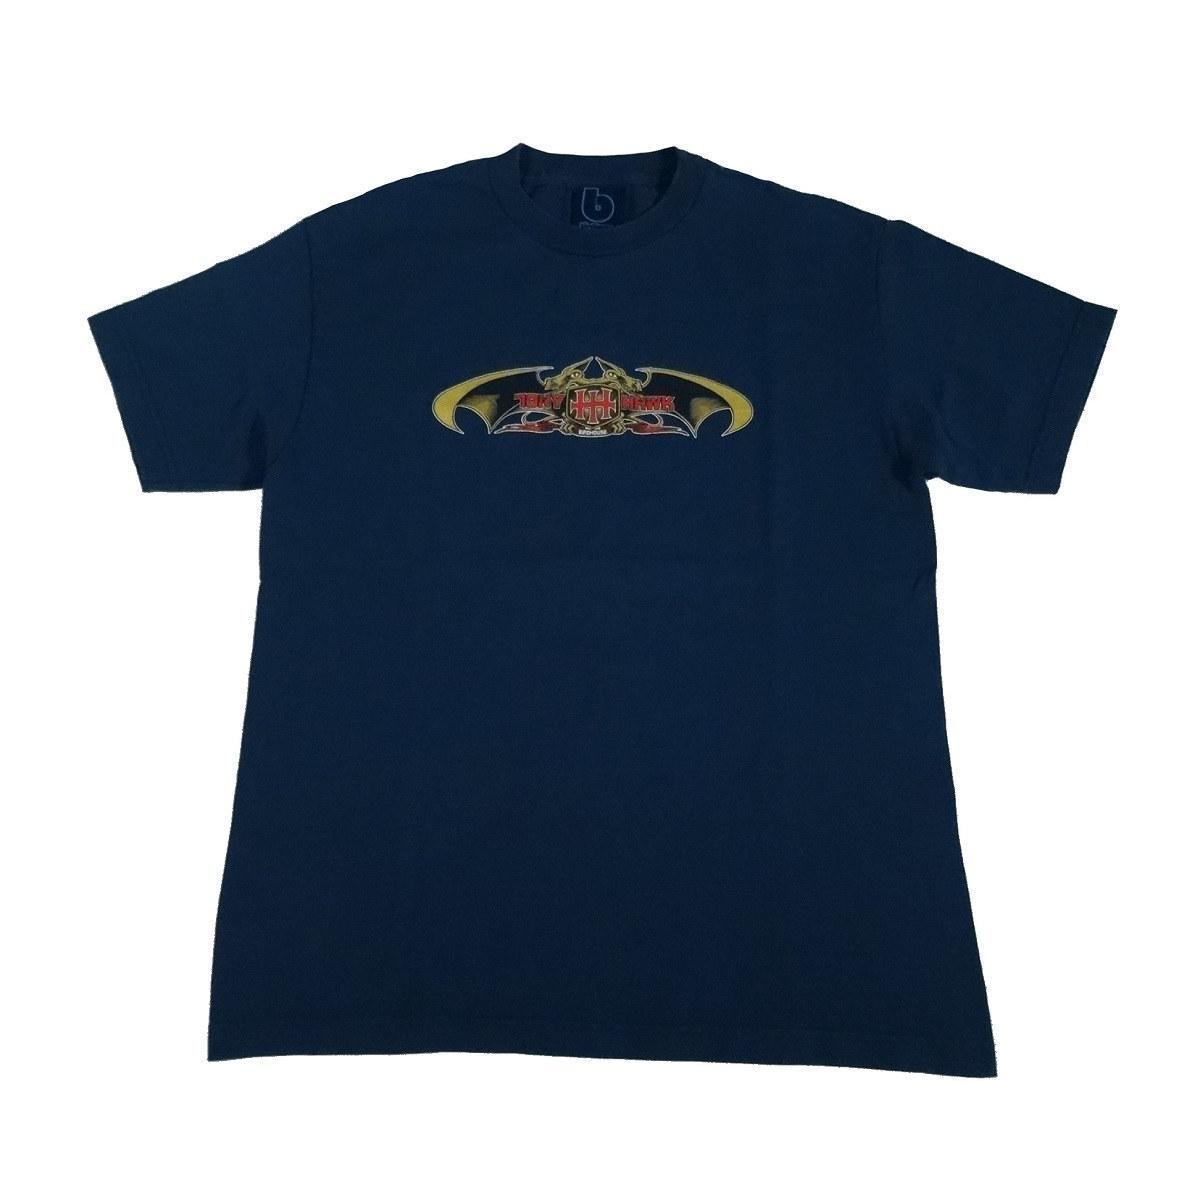 tony hawk birdhouse vintage t shirt front